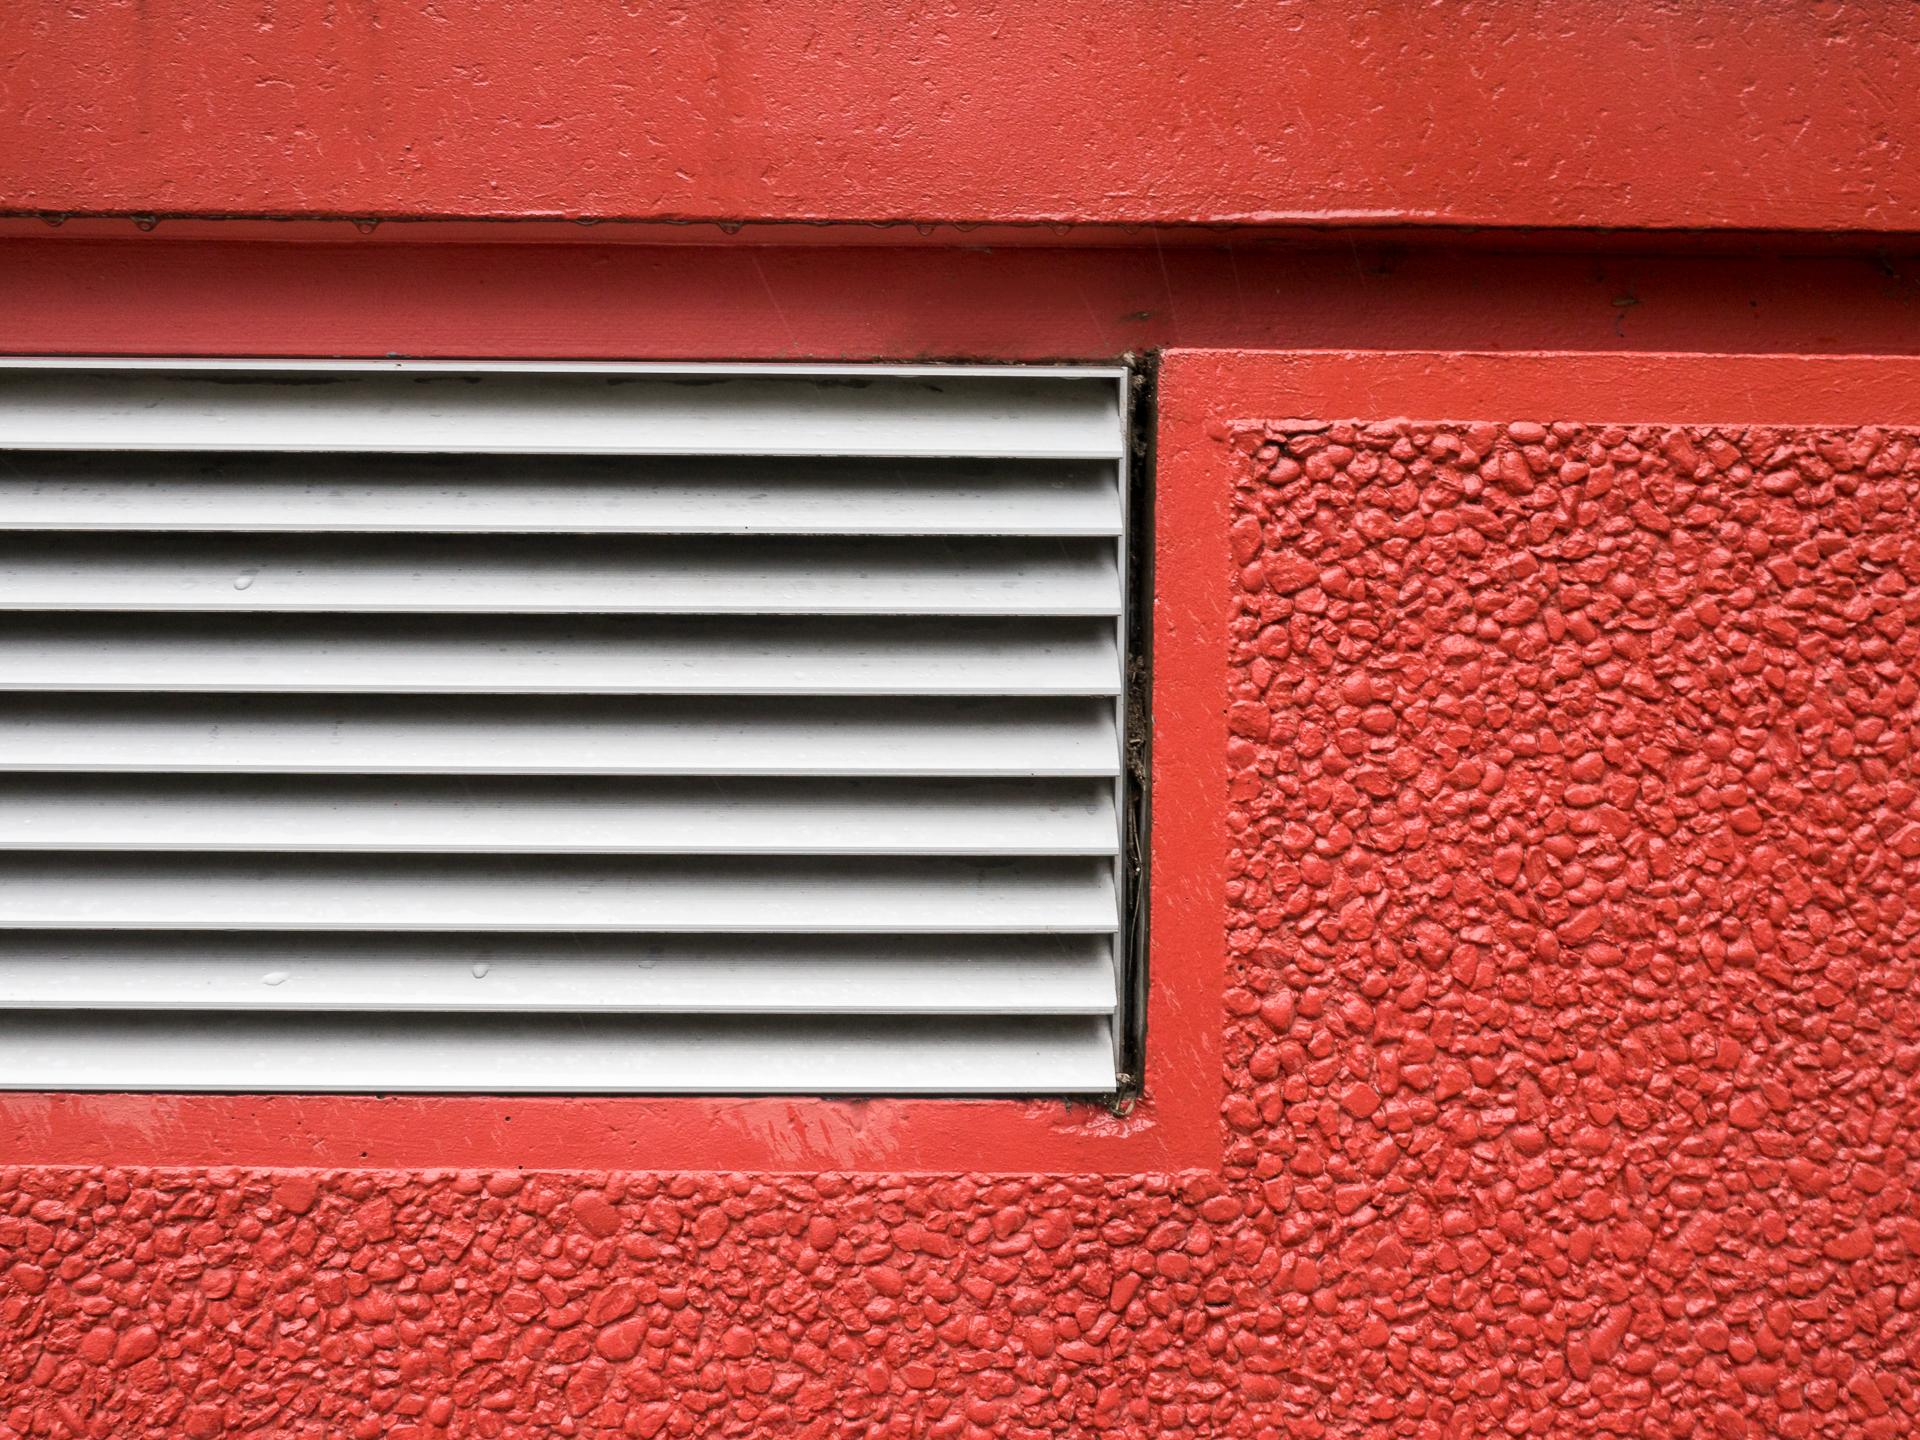 Gambar Abstrak Tekstur Lantai Dinding Garis Merah Warna